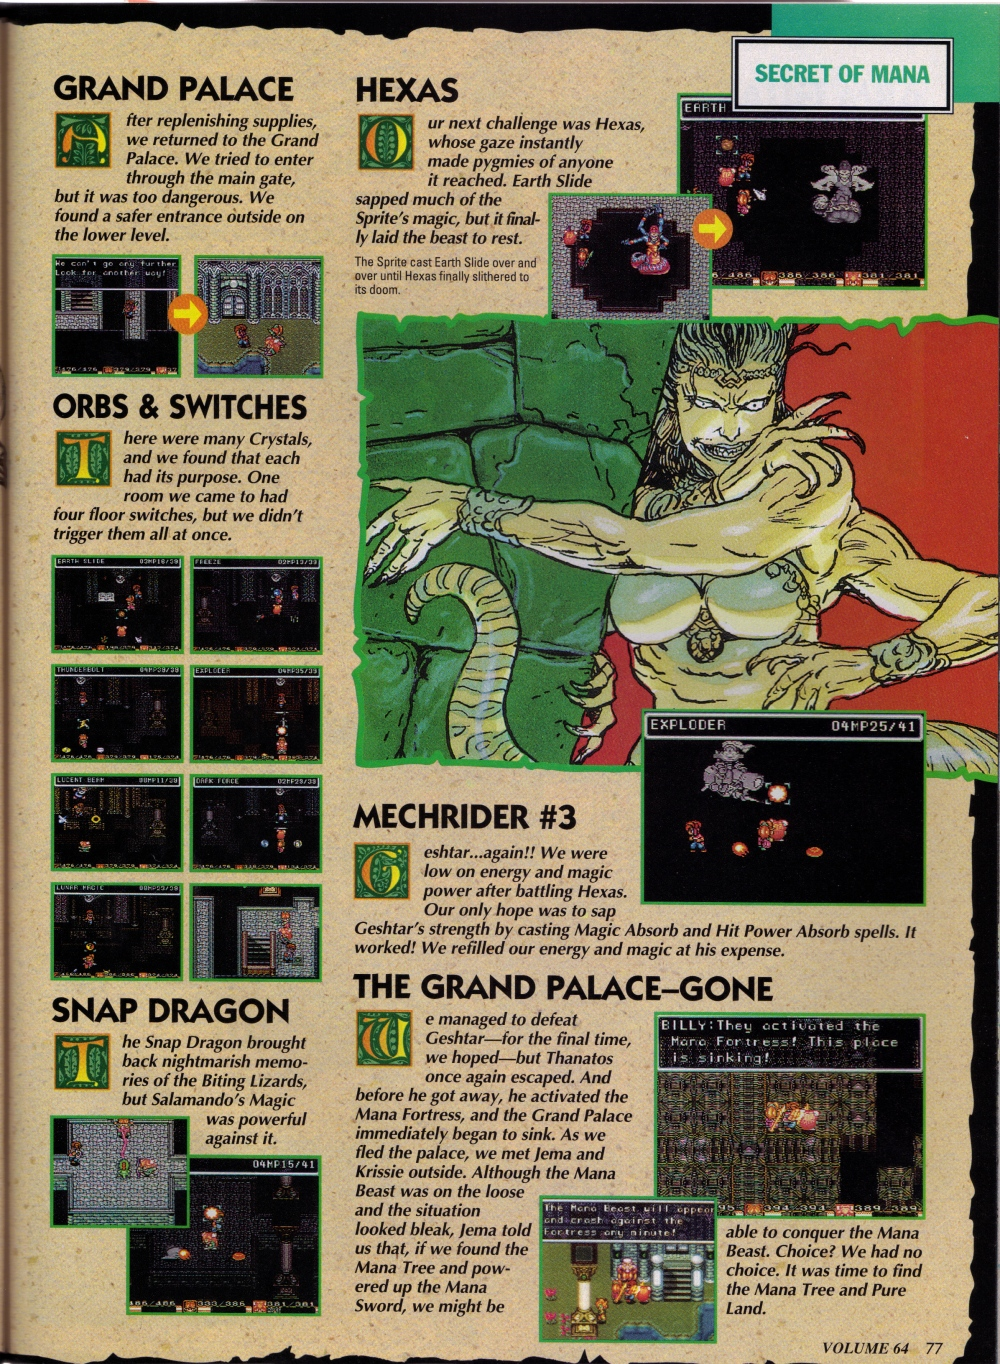 Nintendo Power Volume 64 Mortal Kombat 2 Cover w/ Donkey Kong Country Poster